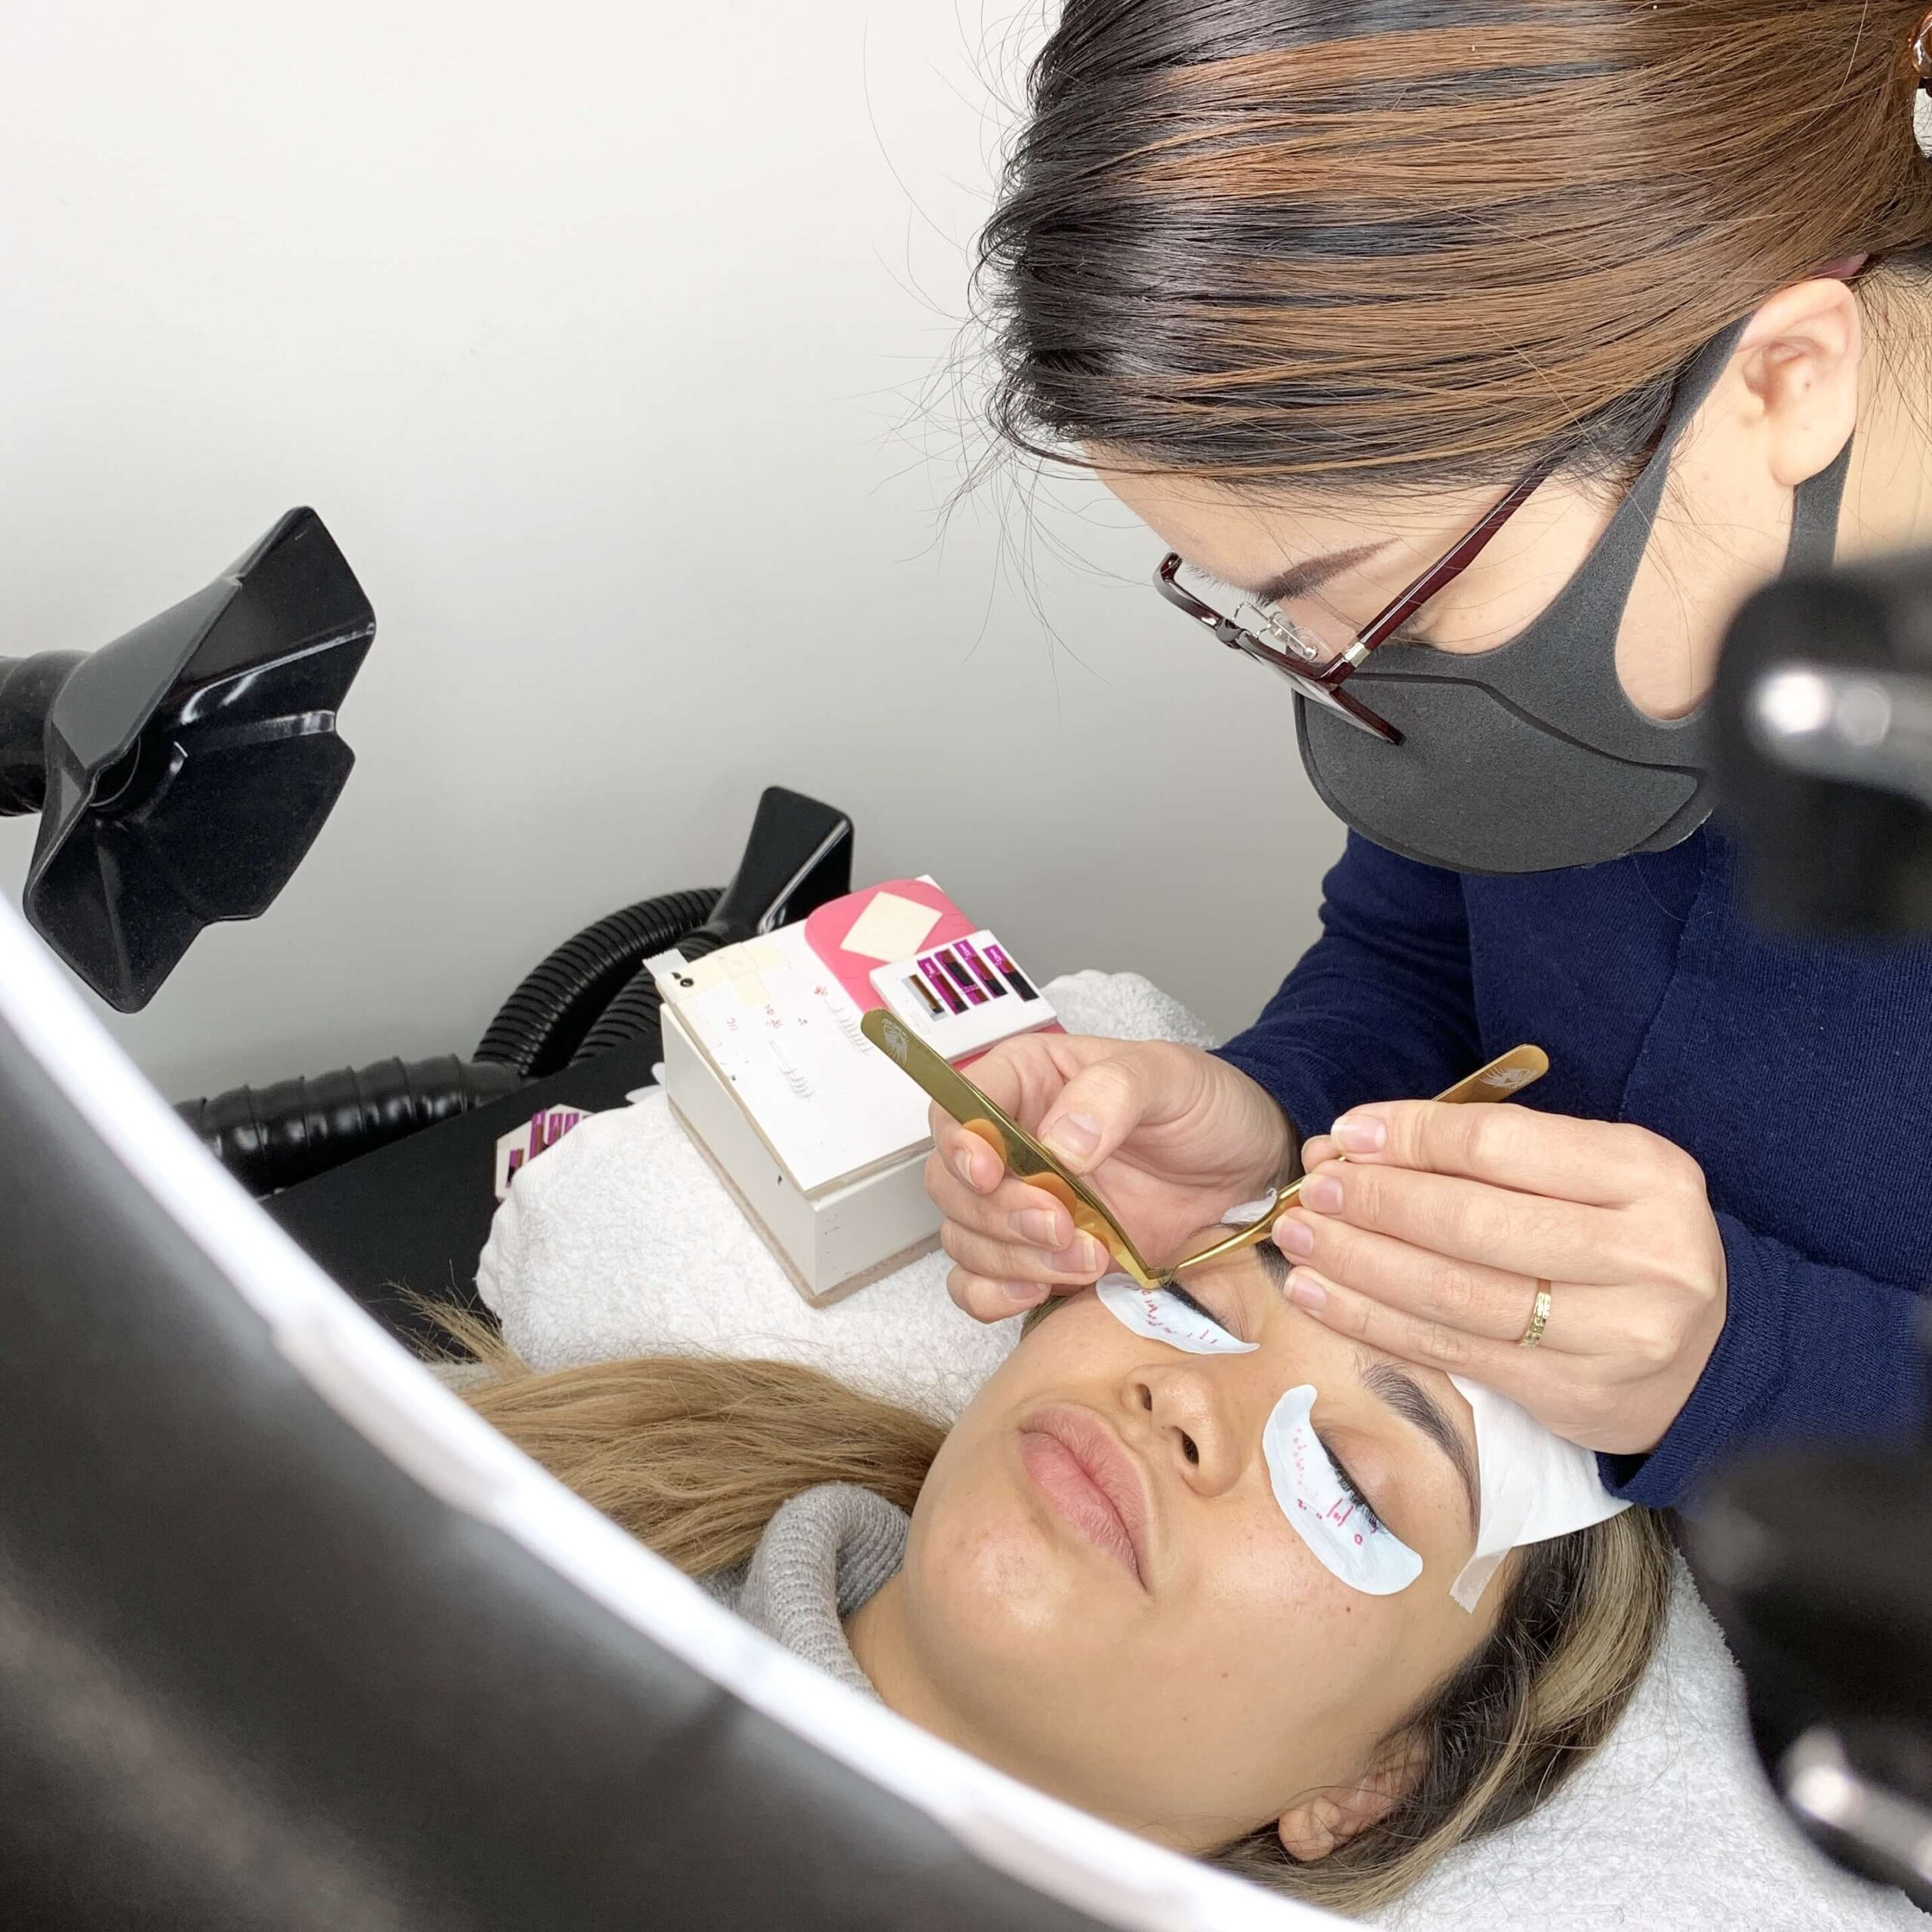 Eyewonderlust Importance of Refilling Eyelash Extensions Blog - Eyelash Technician Working on Woman Client Eyelashes